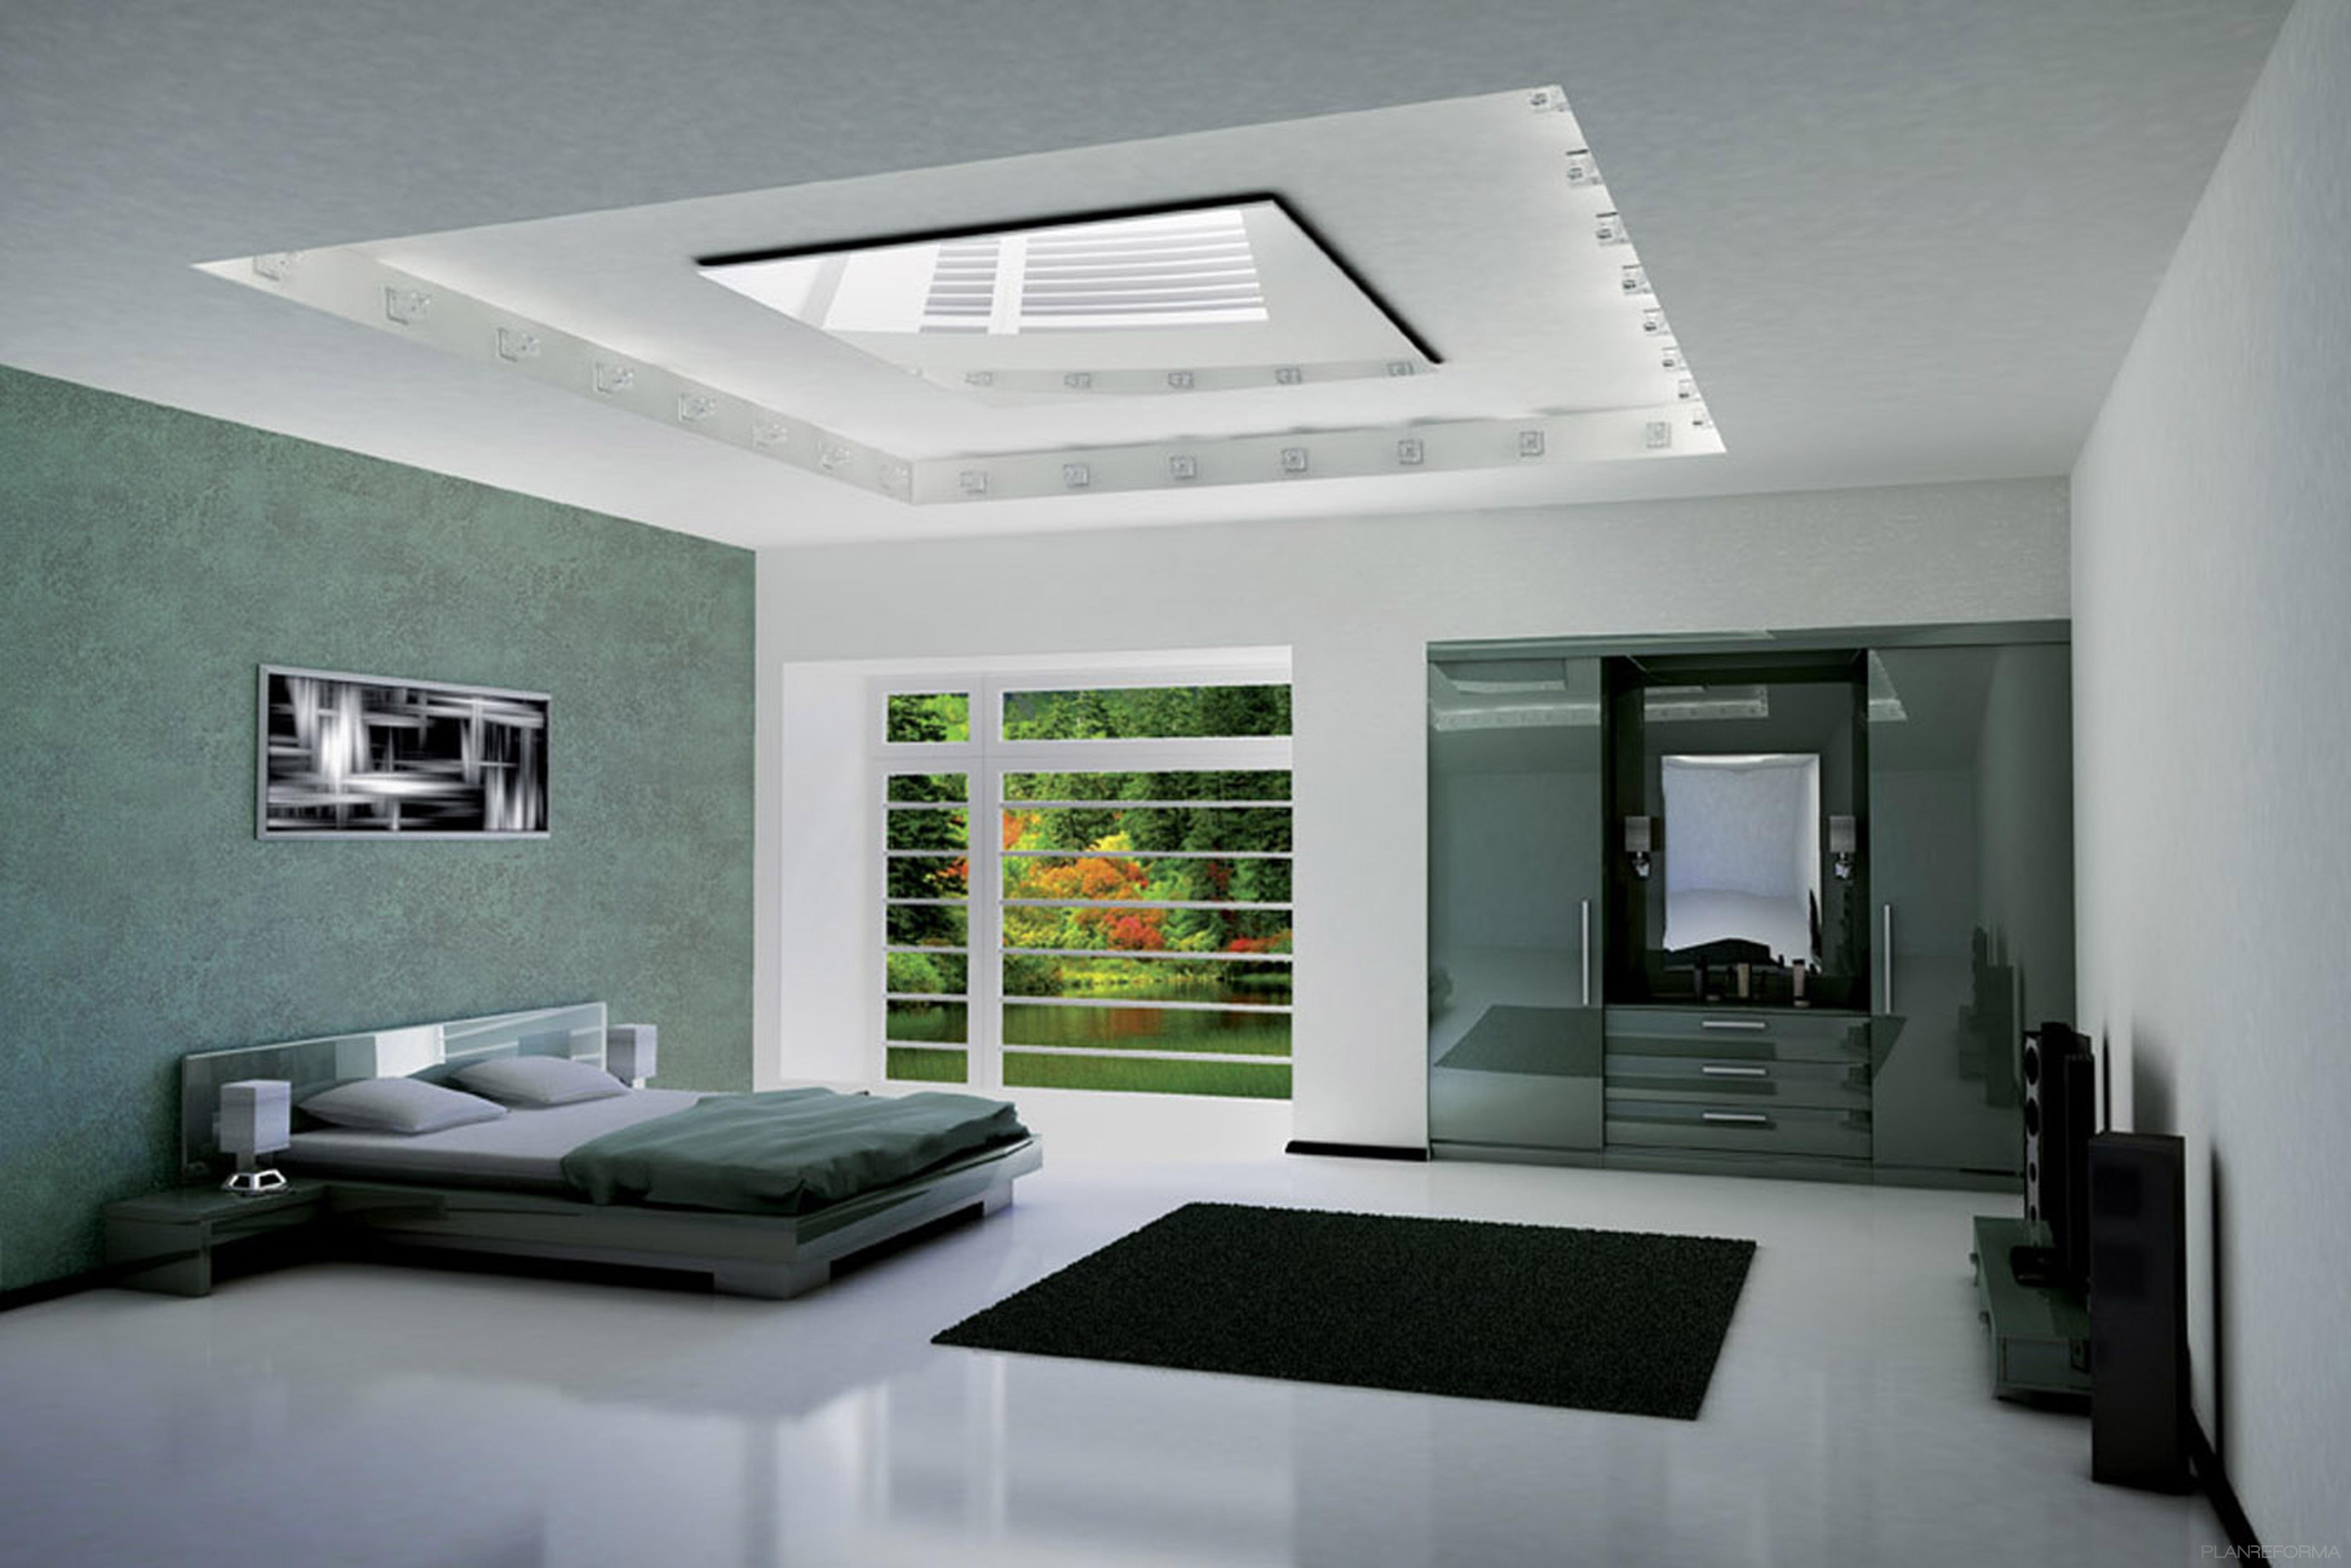 Dormitorio Oficina ~ Dormitorio style moderno color verde, gris, negro